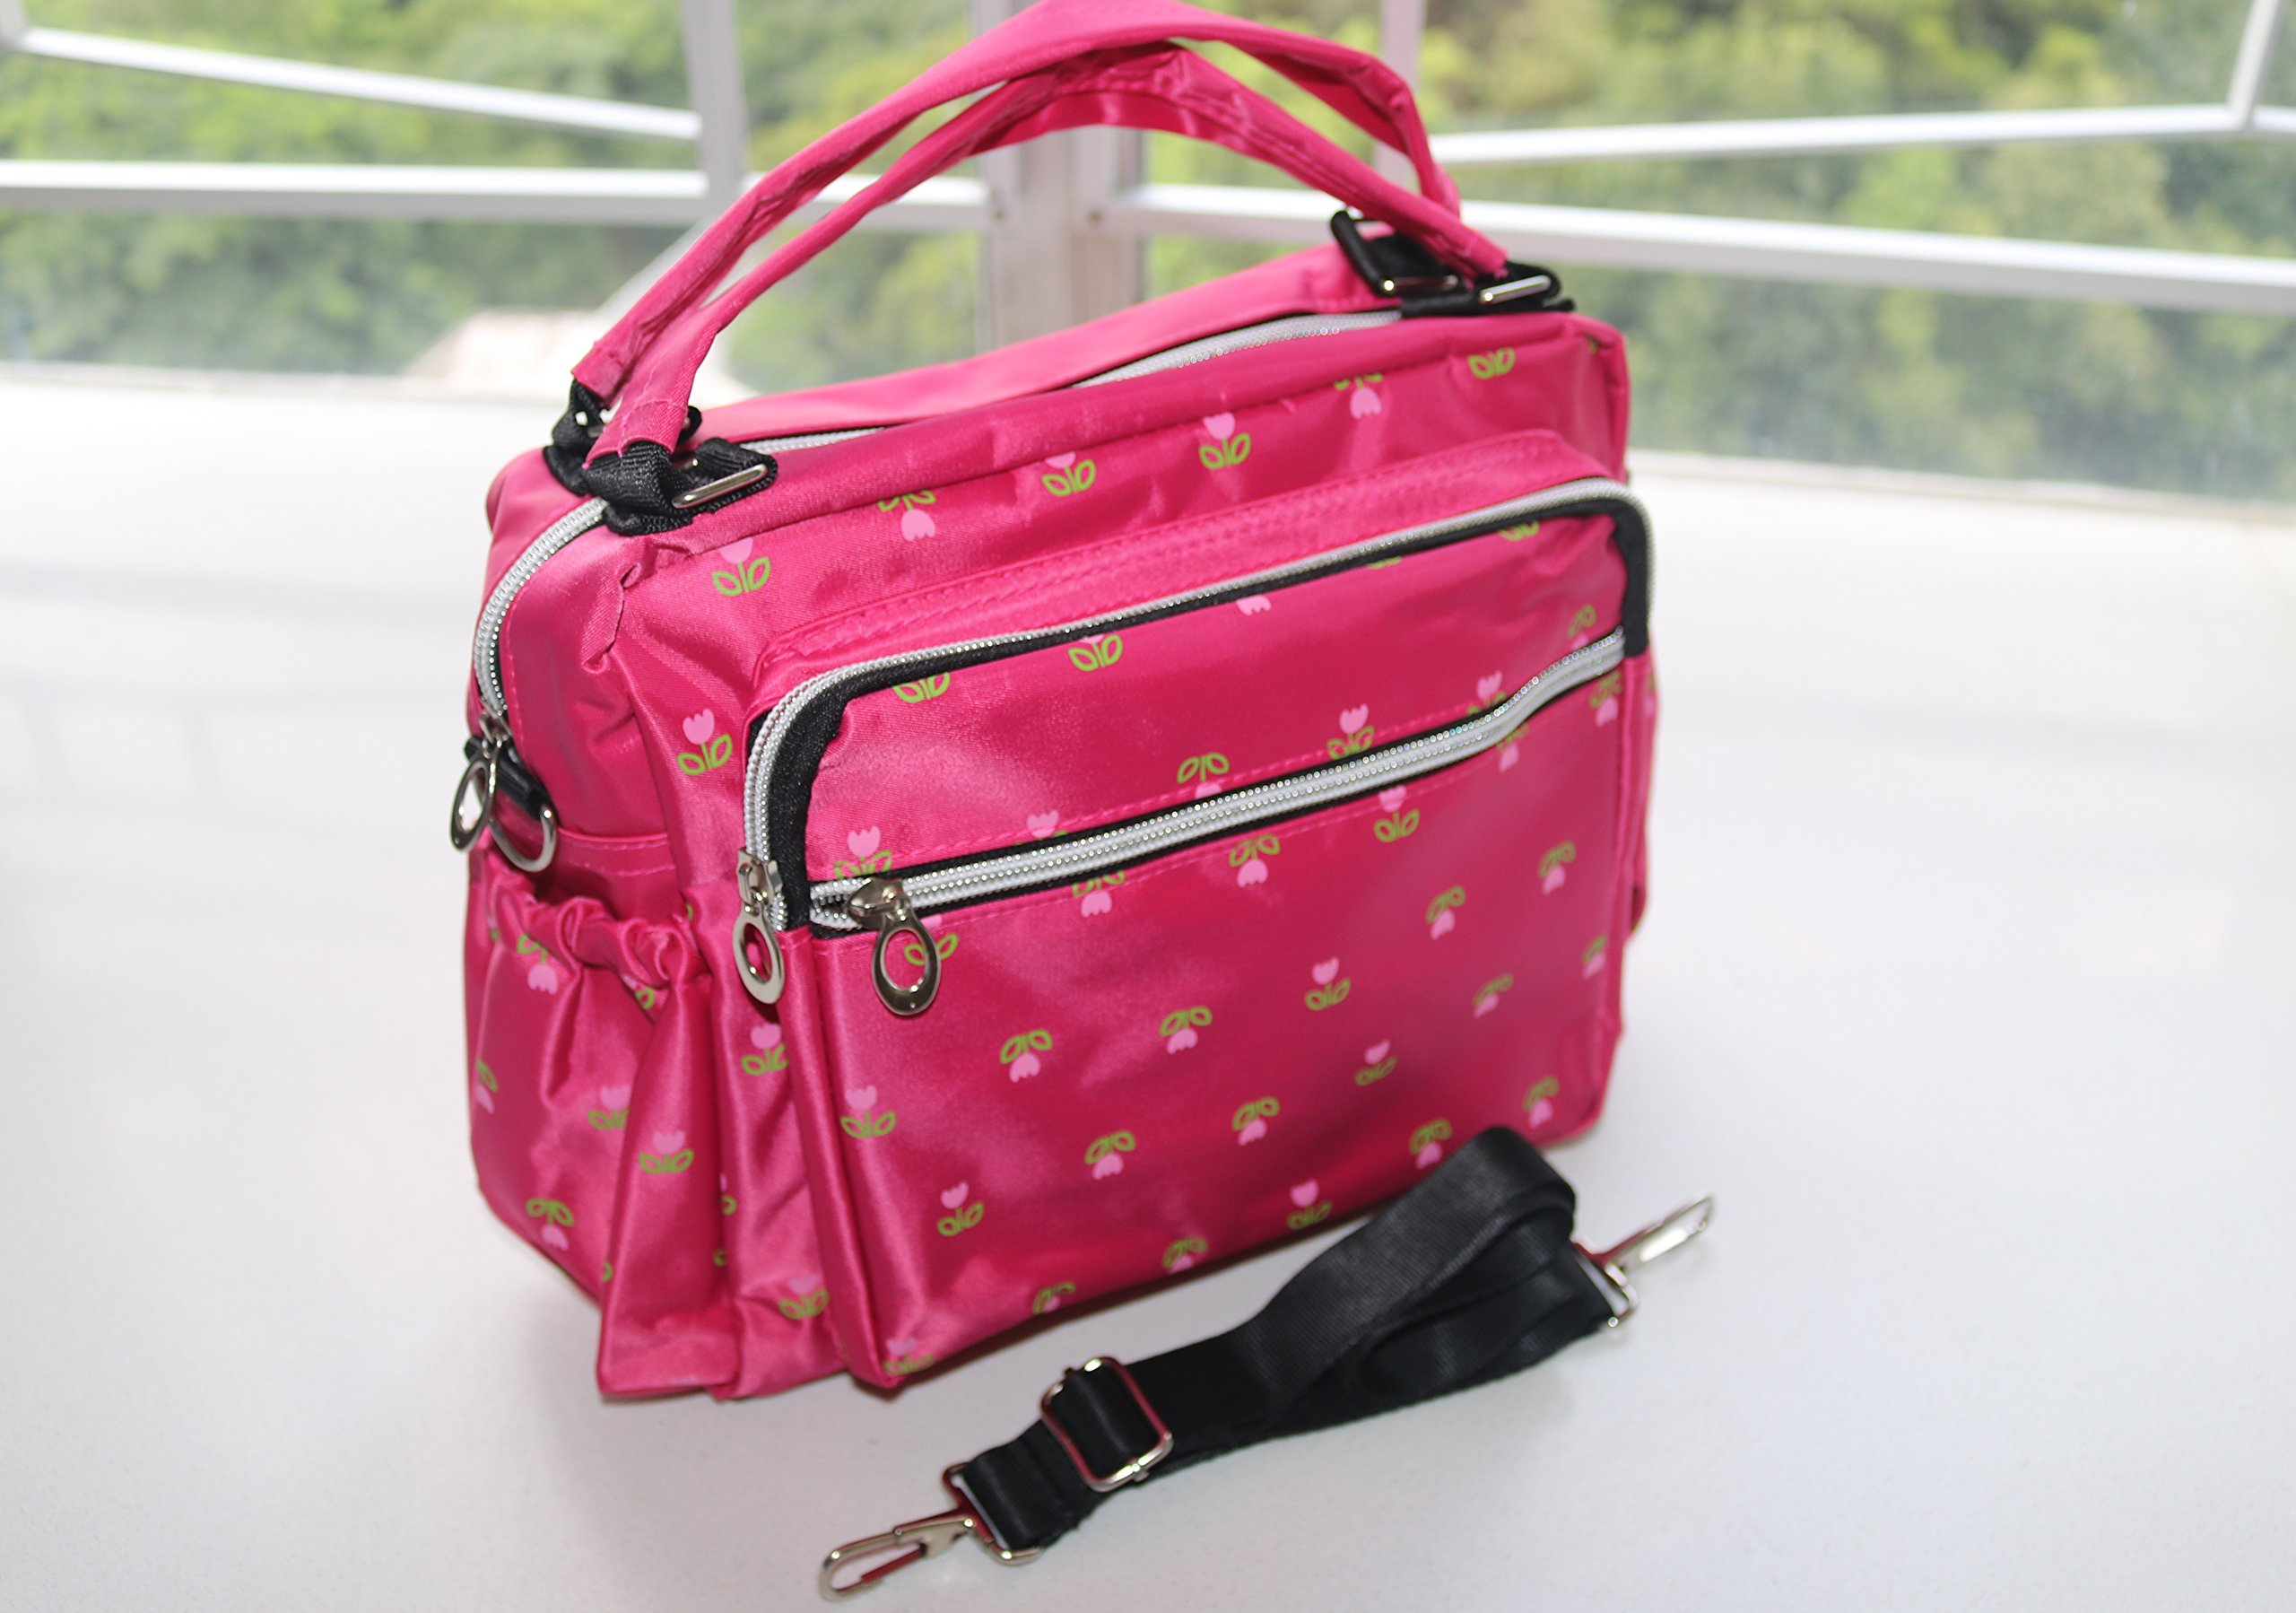 Durable Nylon Crossbody Messenger Handbag with Zipper Pockets (Summer)